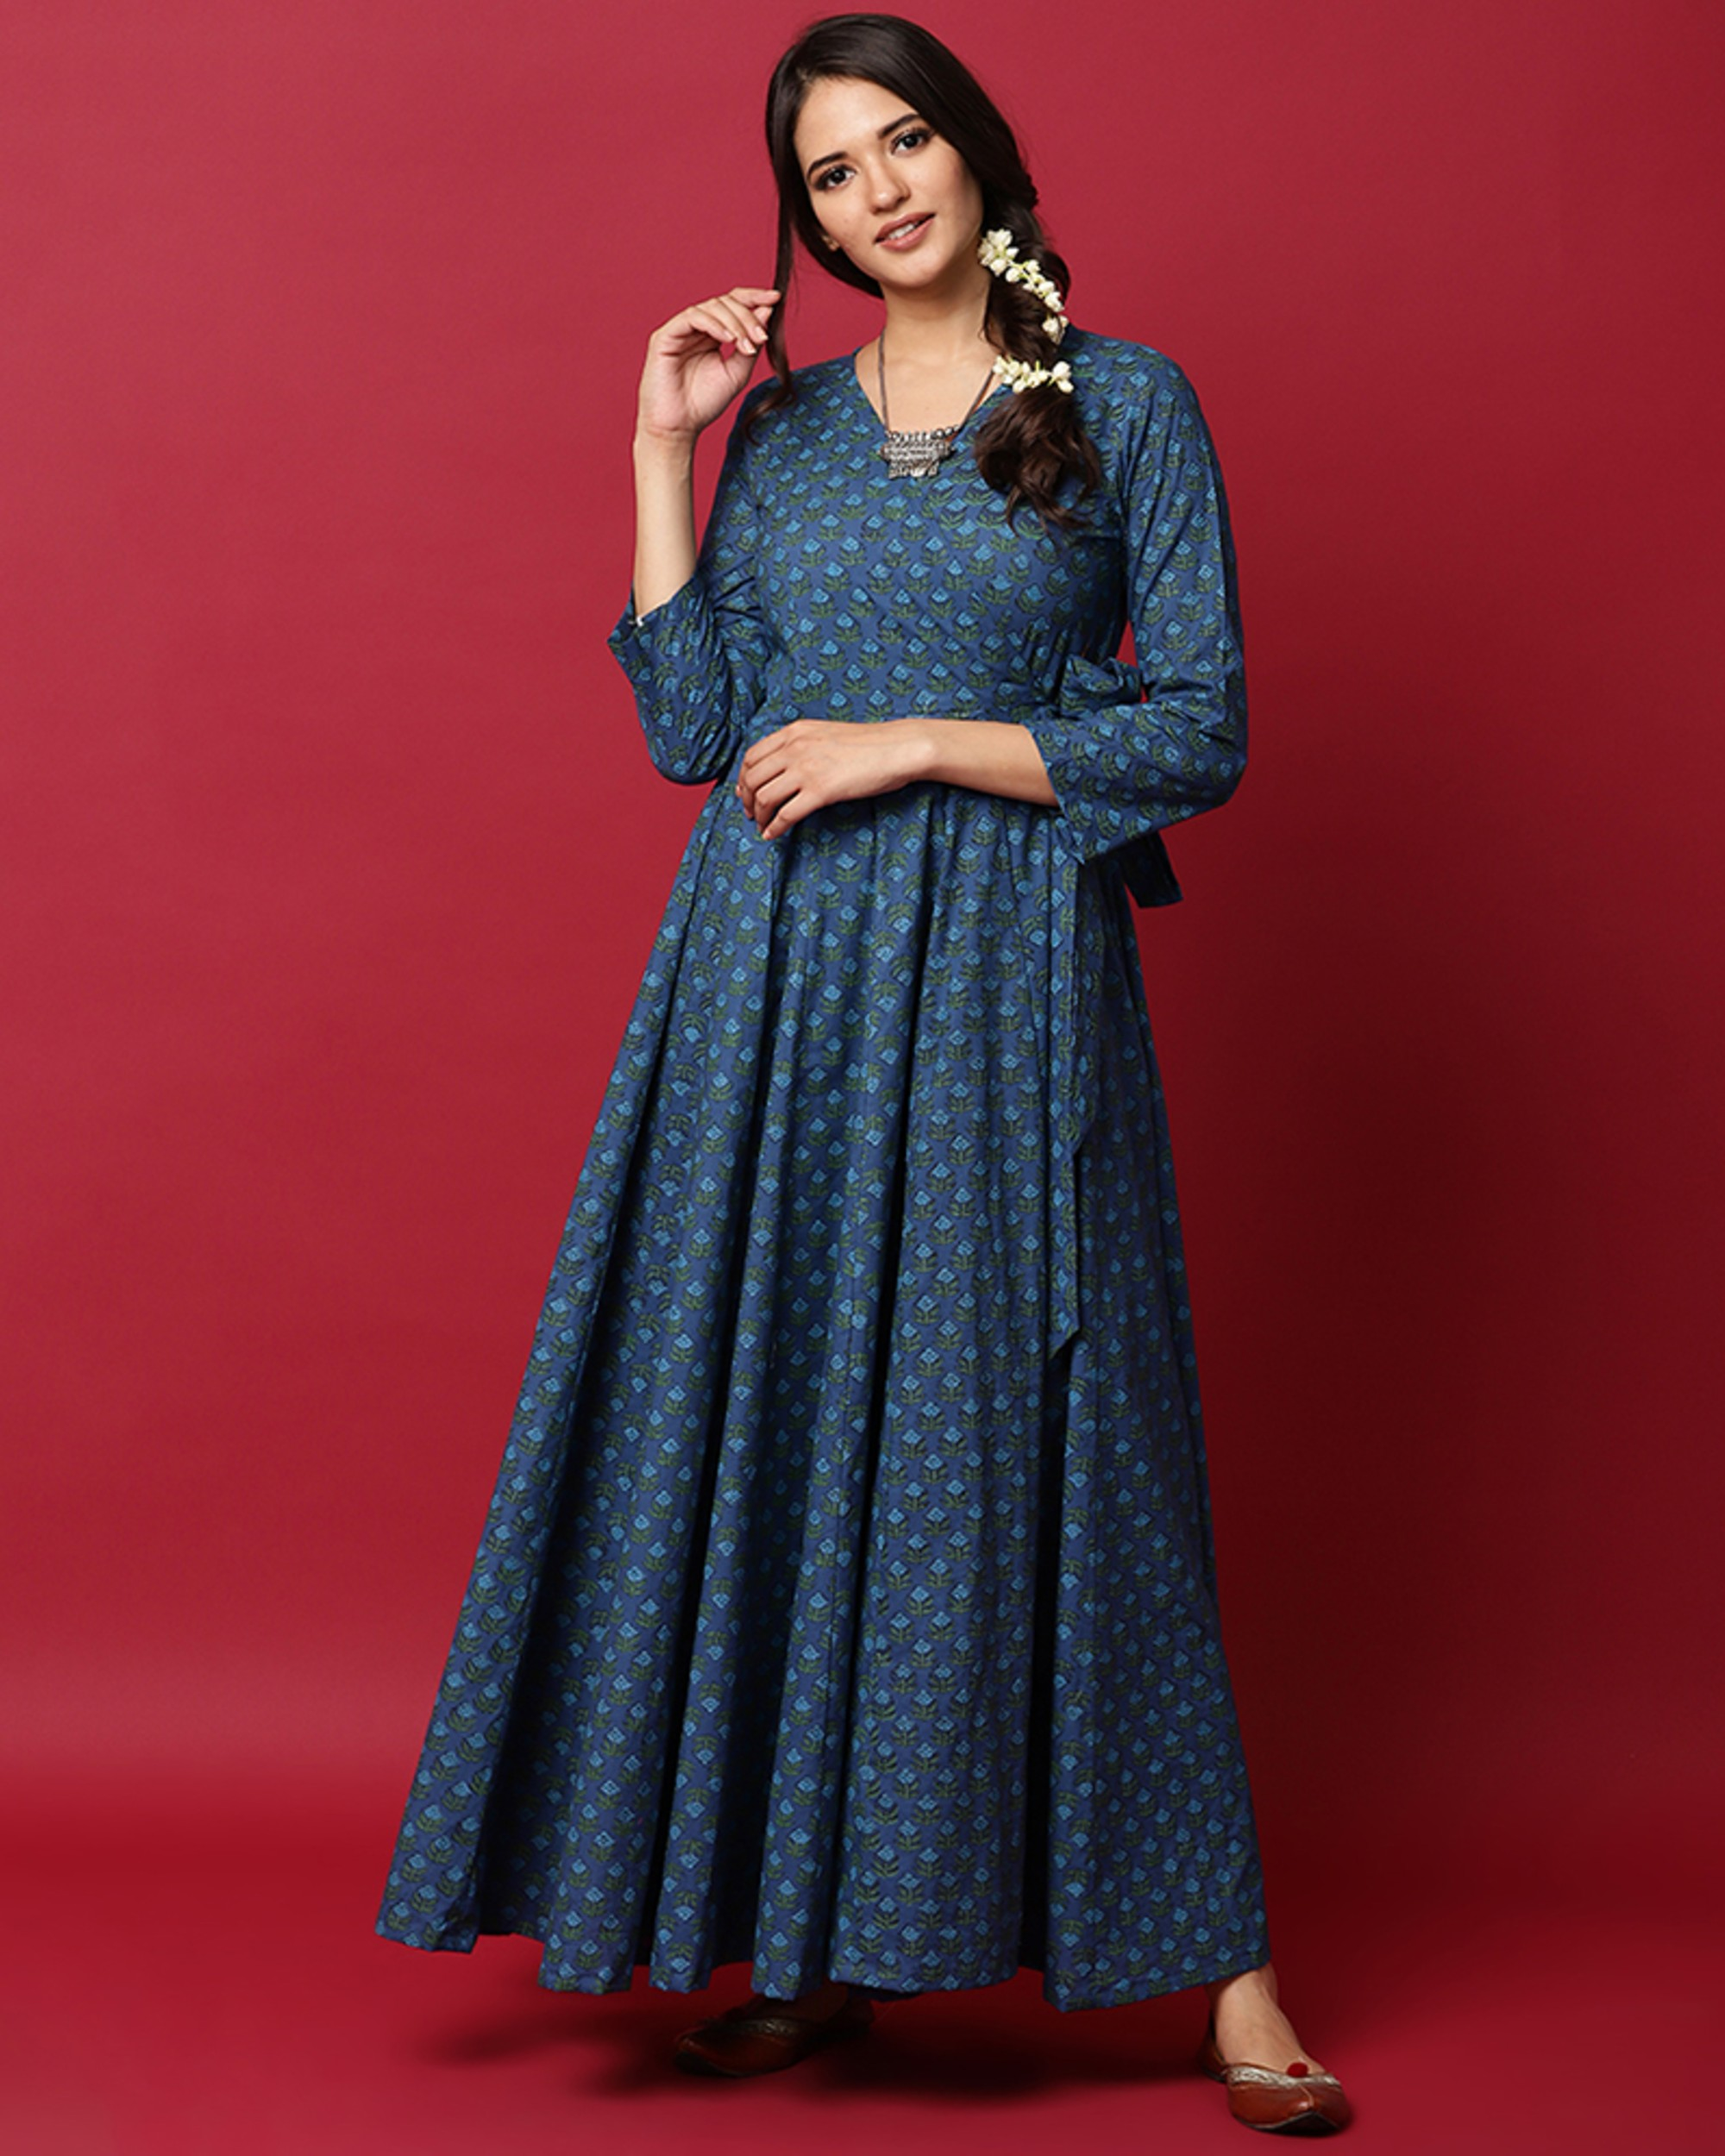 Blue floral printed angrakha dress